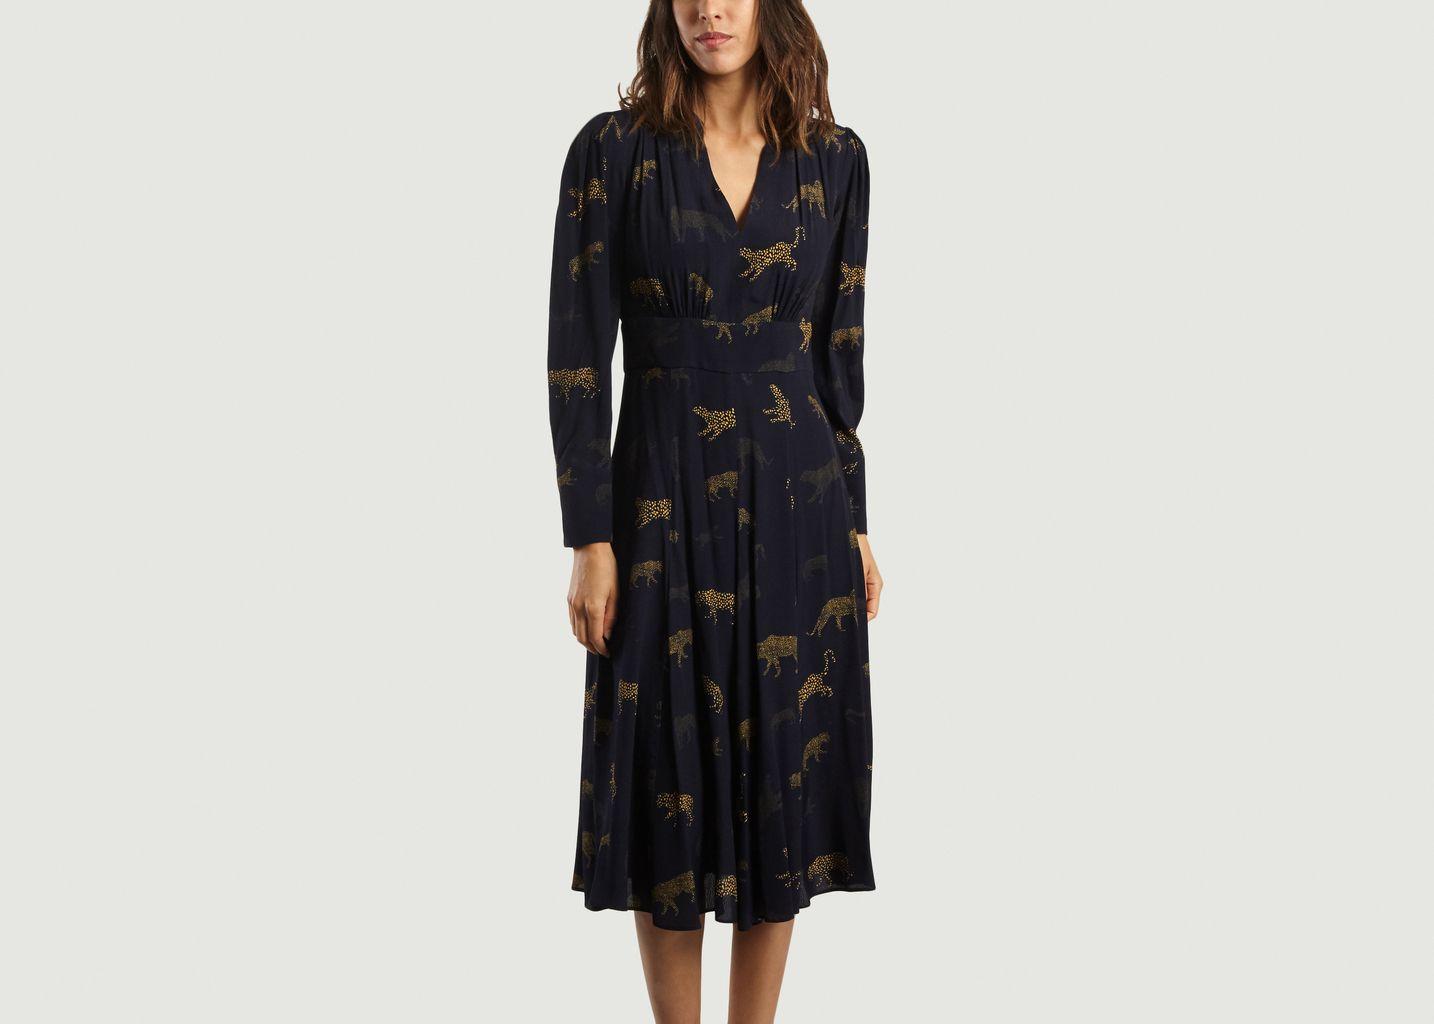 Robe Imprimé Léopard - Tara Jarmon